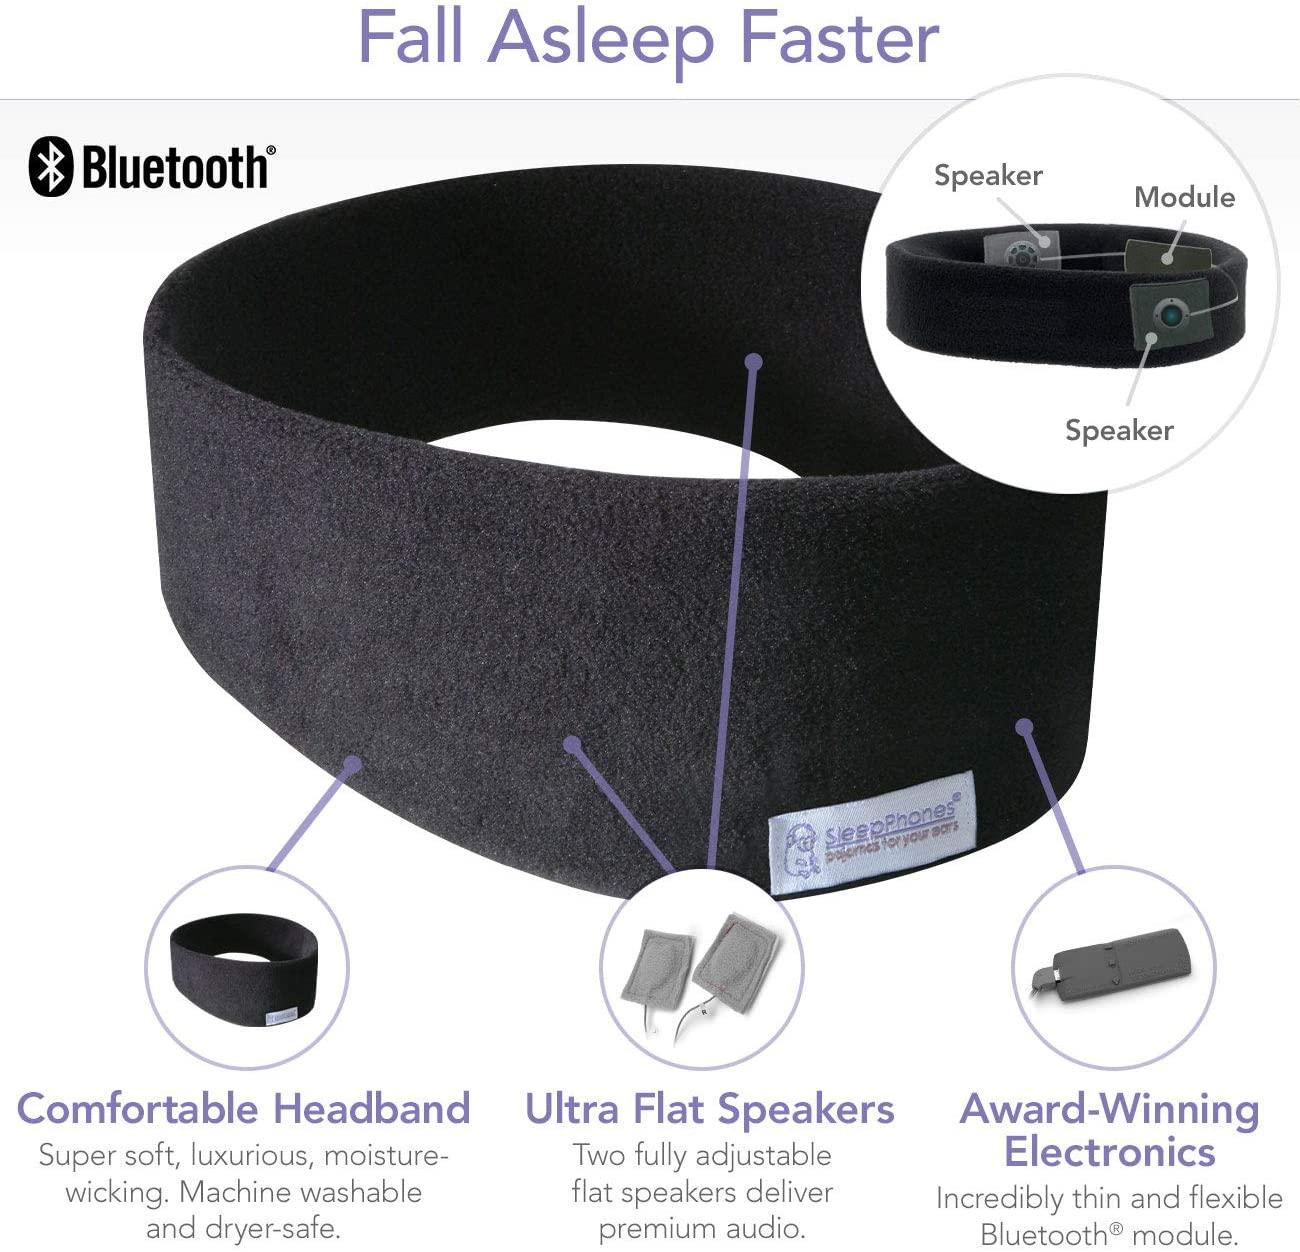 SleepPhones Wireless Sleep Headphones